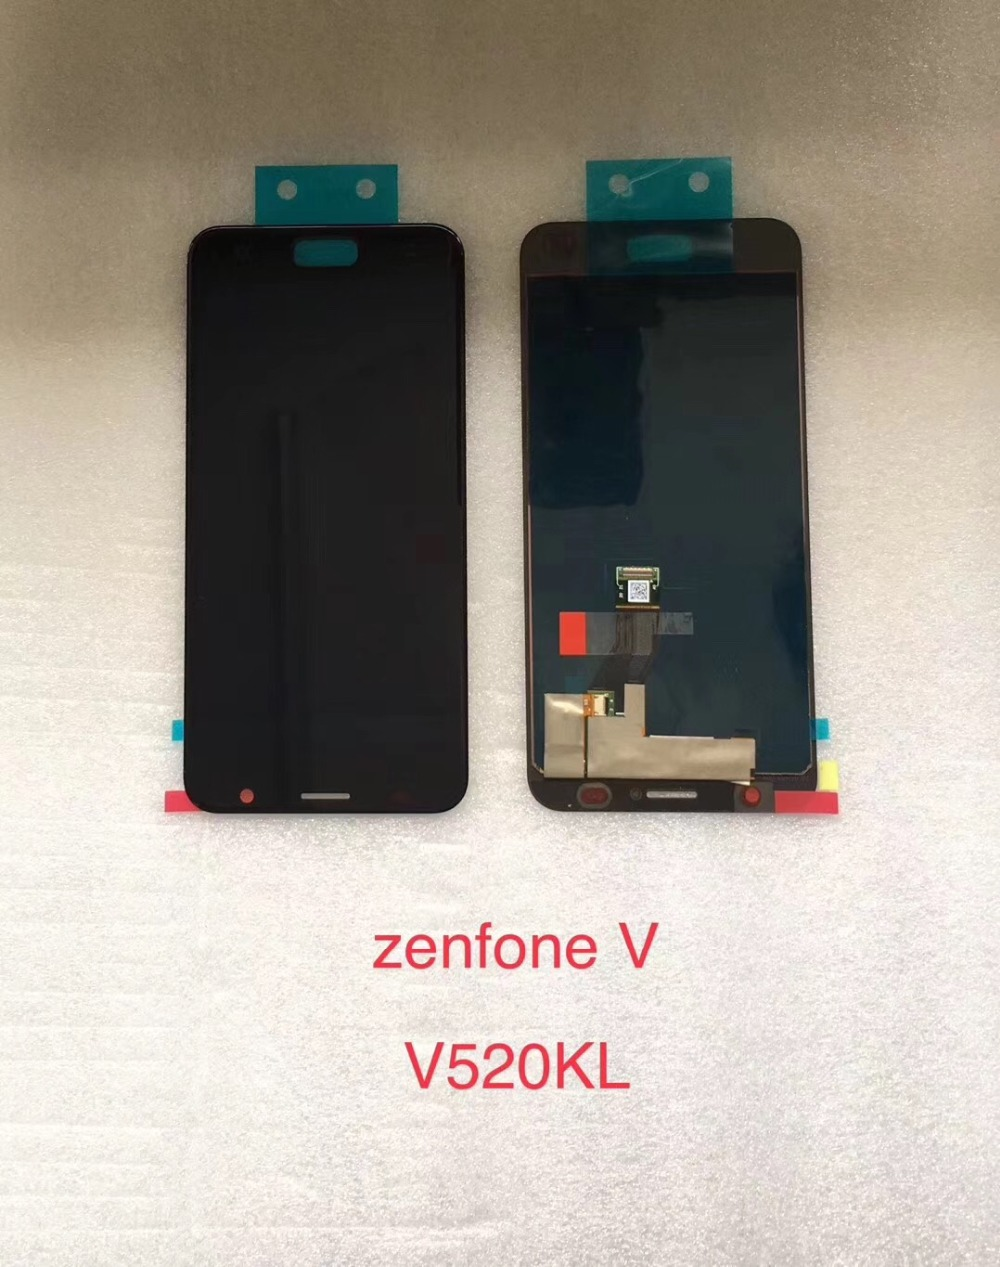 ACKOOLLA мобильный телефон ЖК дисплей для ASUS Zenfone V V520KL A006 аксессуары Запчасти Мобильный телефон ЖК дисплеев Сенсорный экран